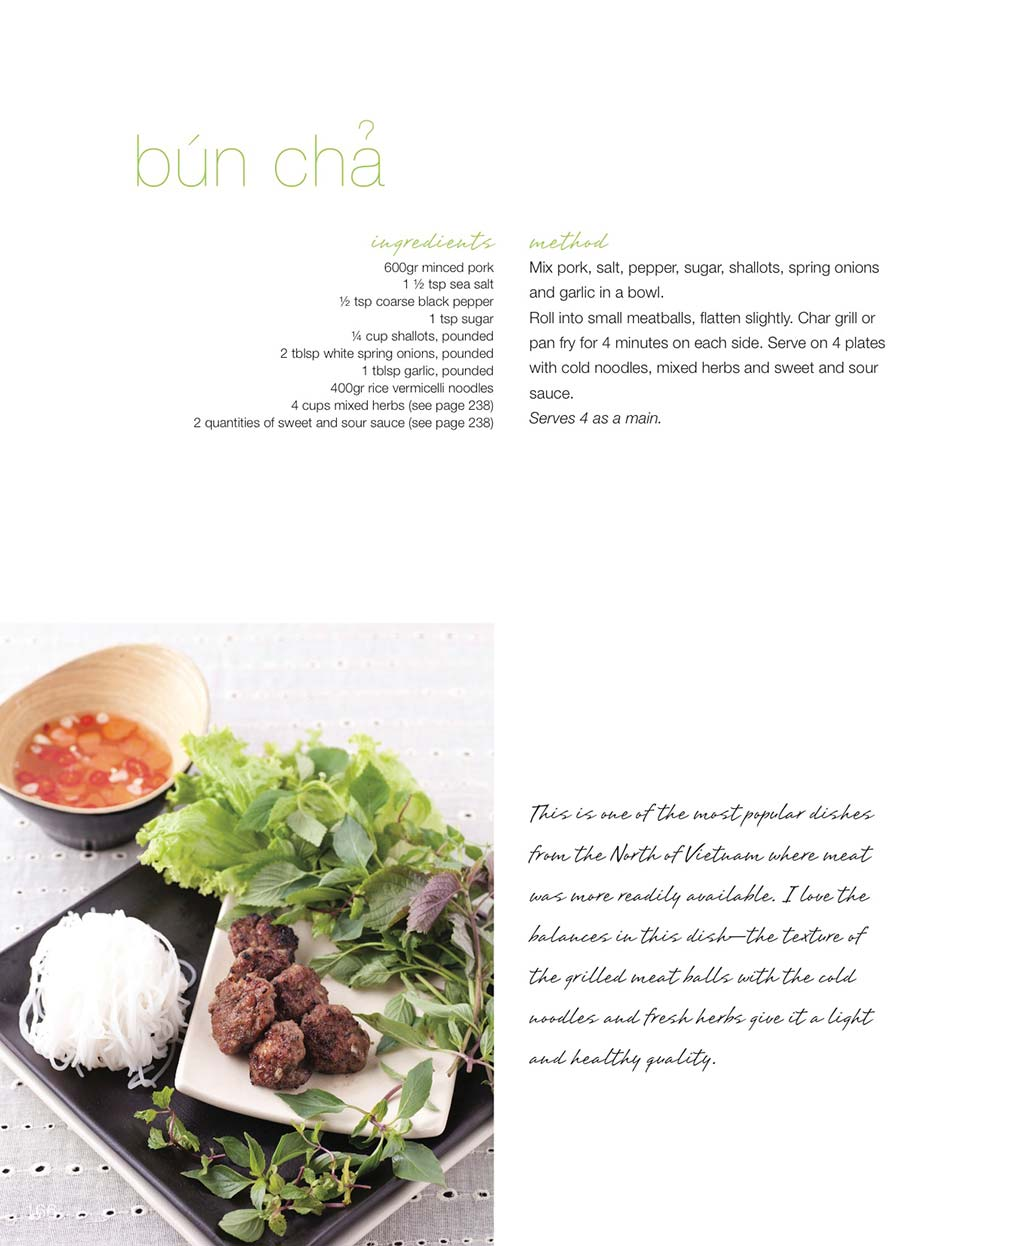 Morning glory cookbook taste vietnam preview the cookbook forumfinder Gallery